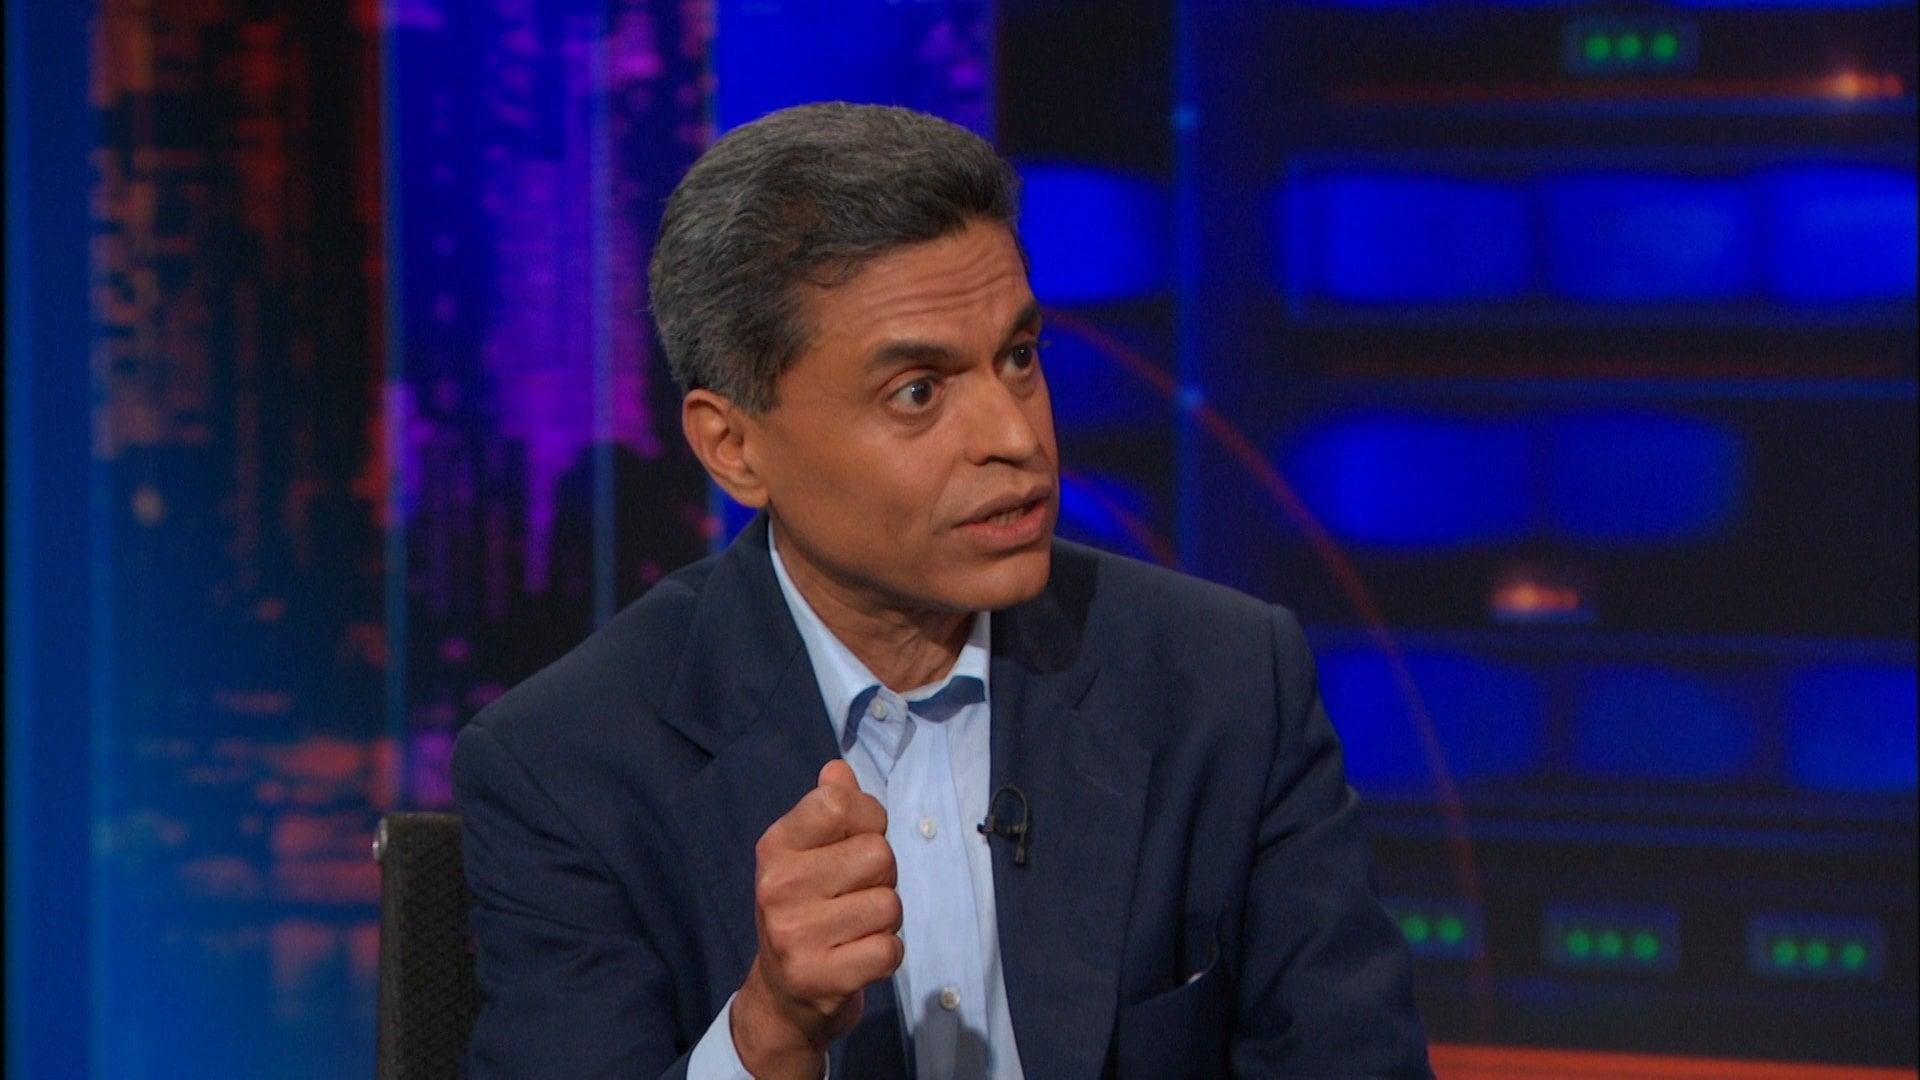 The Daily Show with Trevor Noah Season 19 :Episode 134  Fareed Zakaria